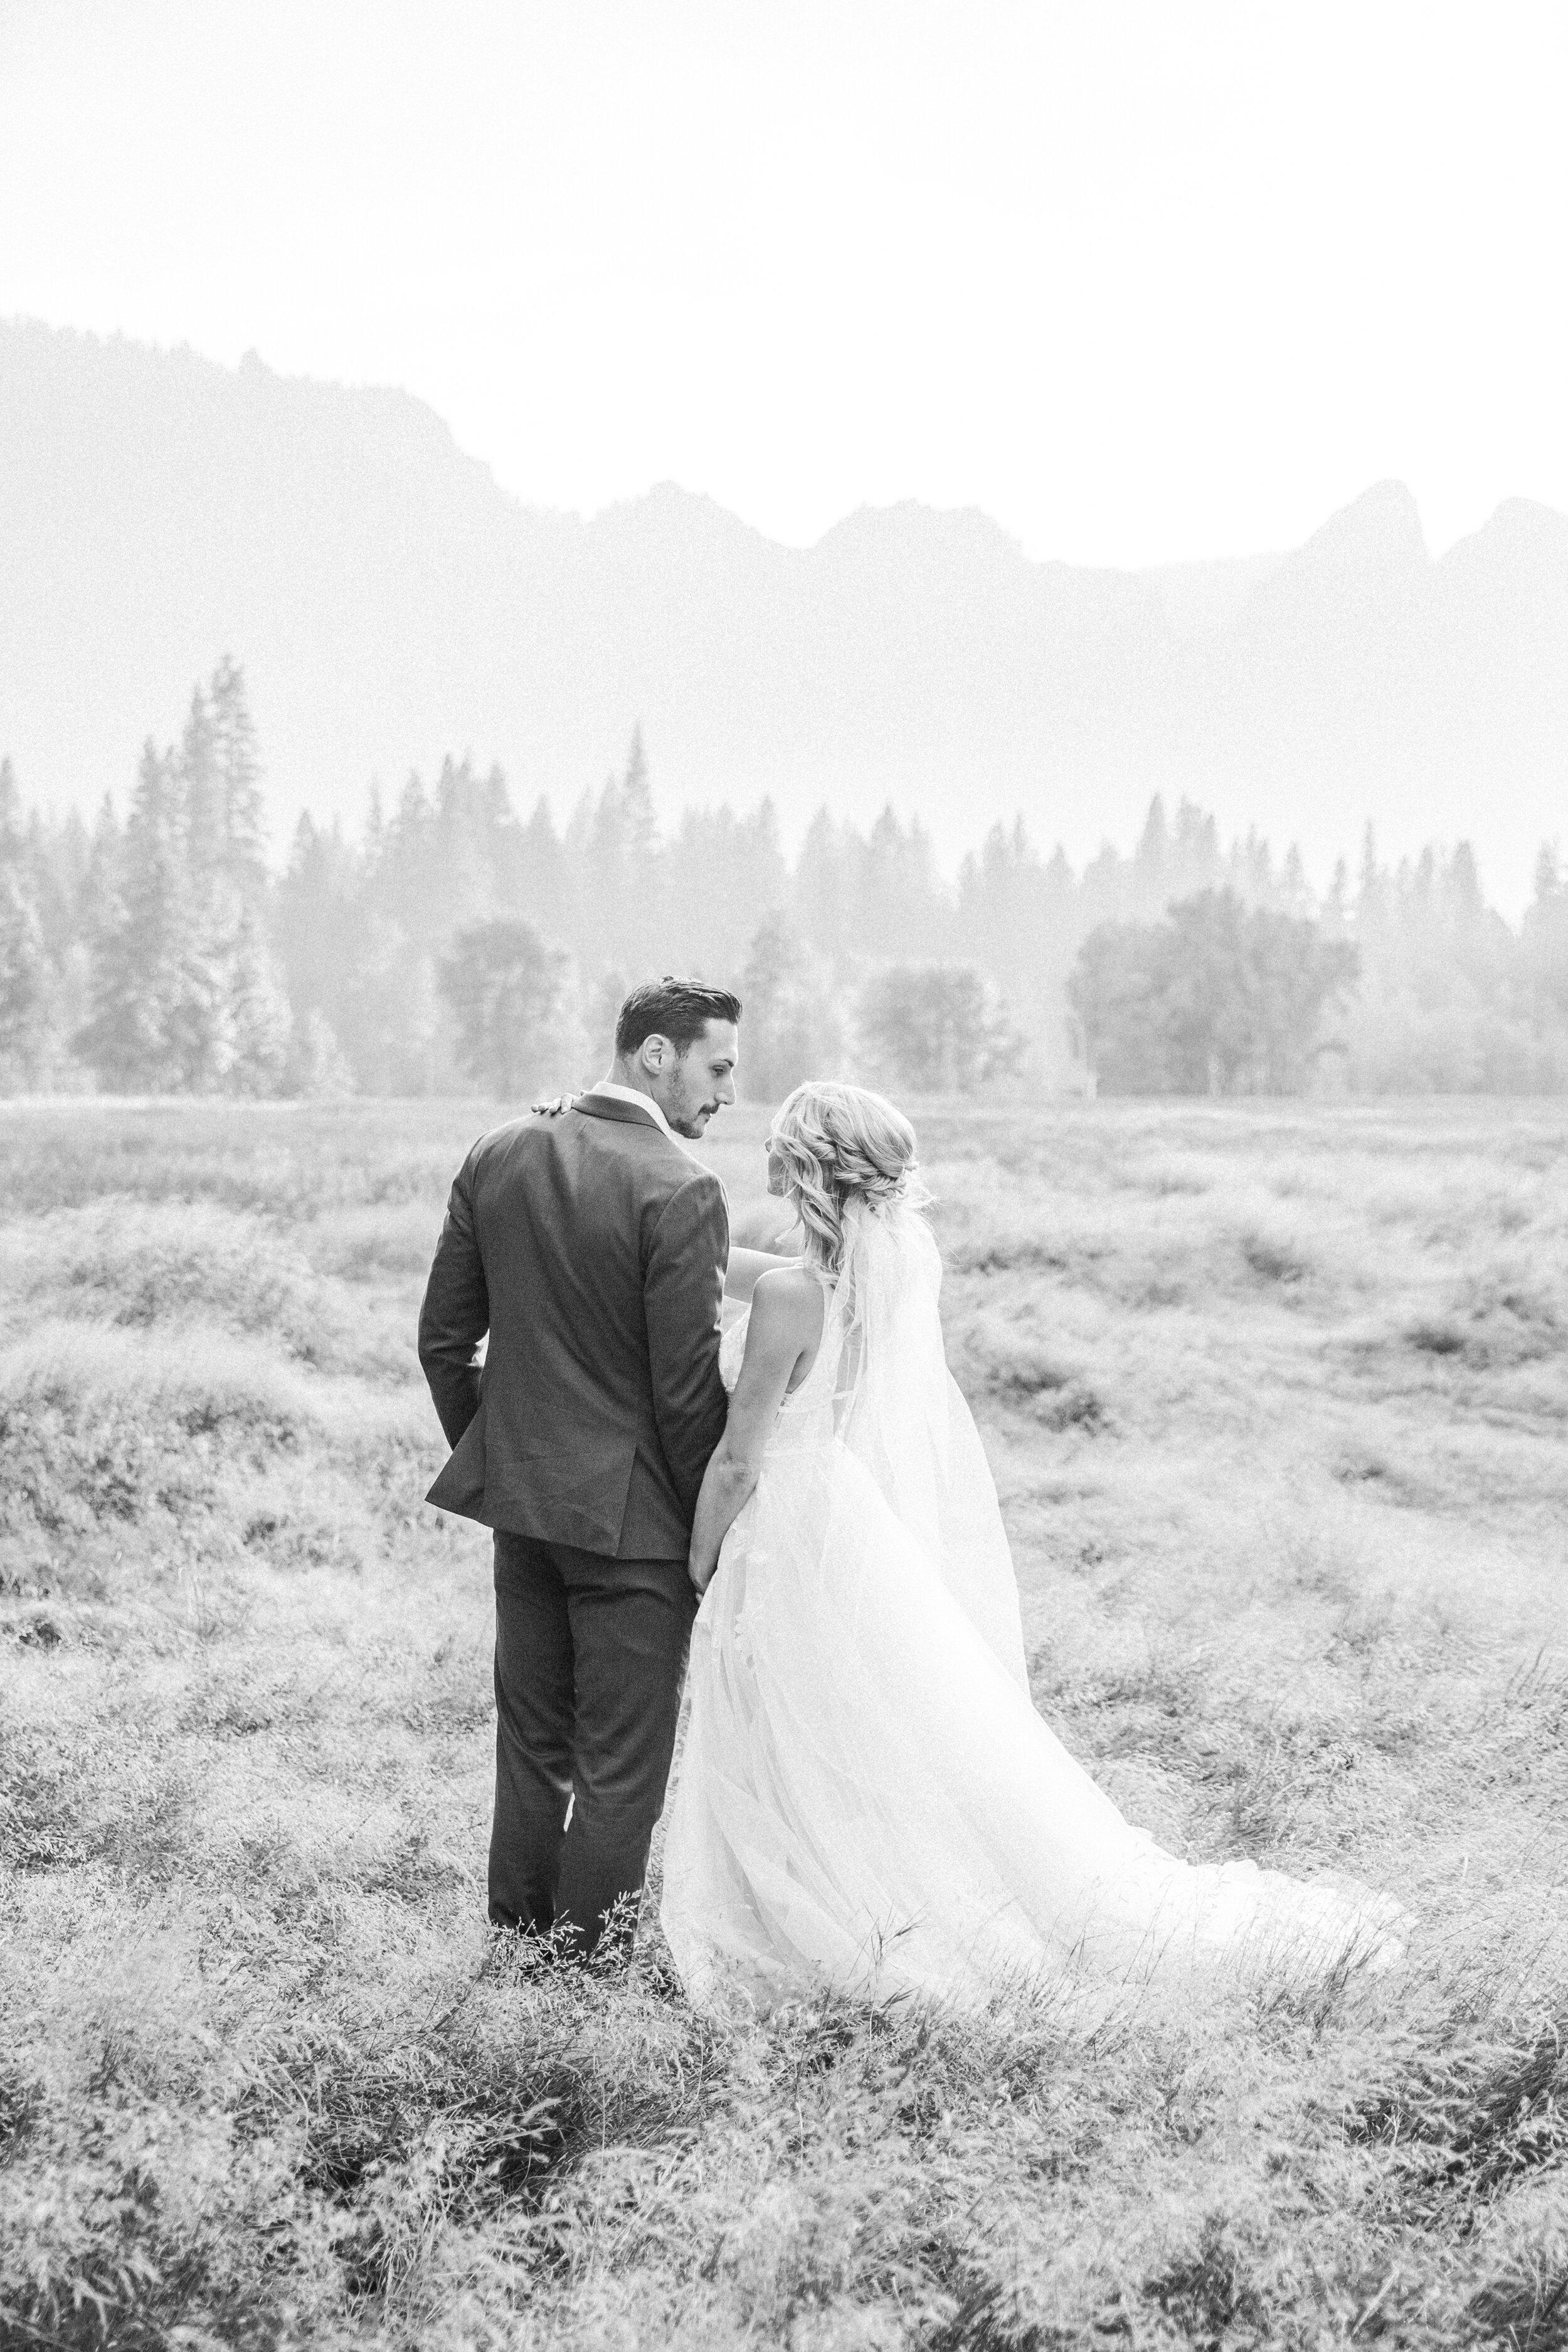 Leanne and Joe - Married - Sneak Peeks - Lauren Alisse Photography-38.jpg